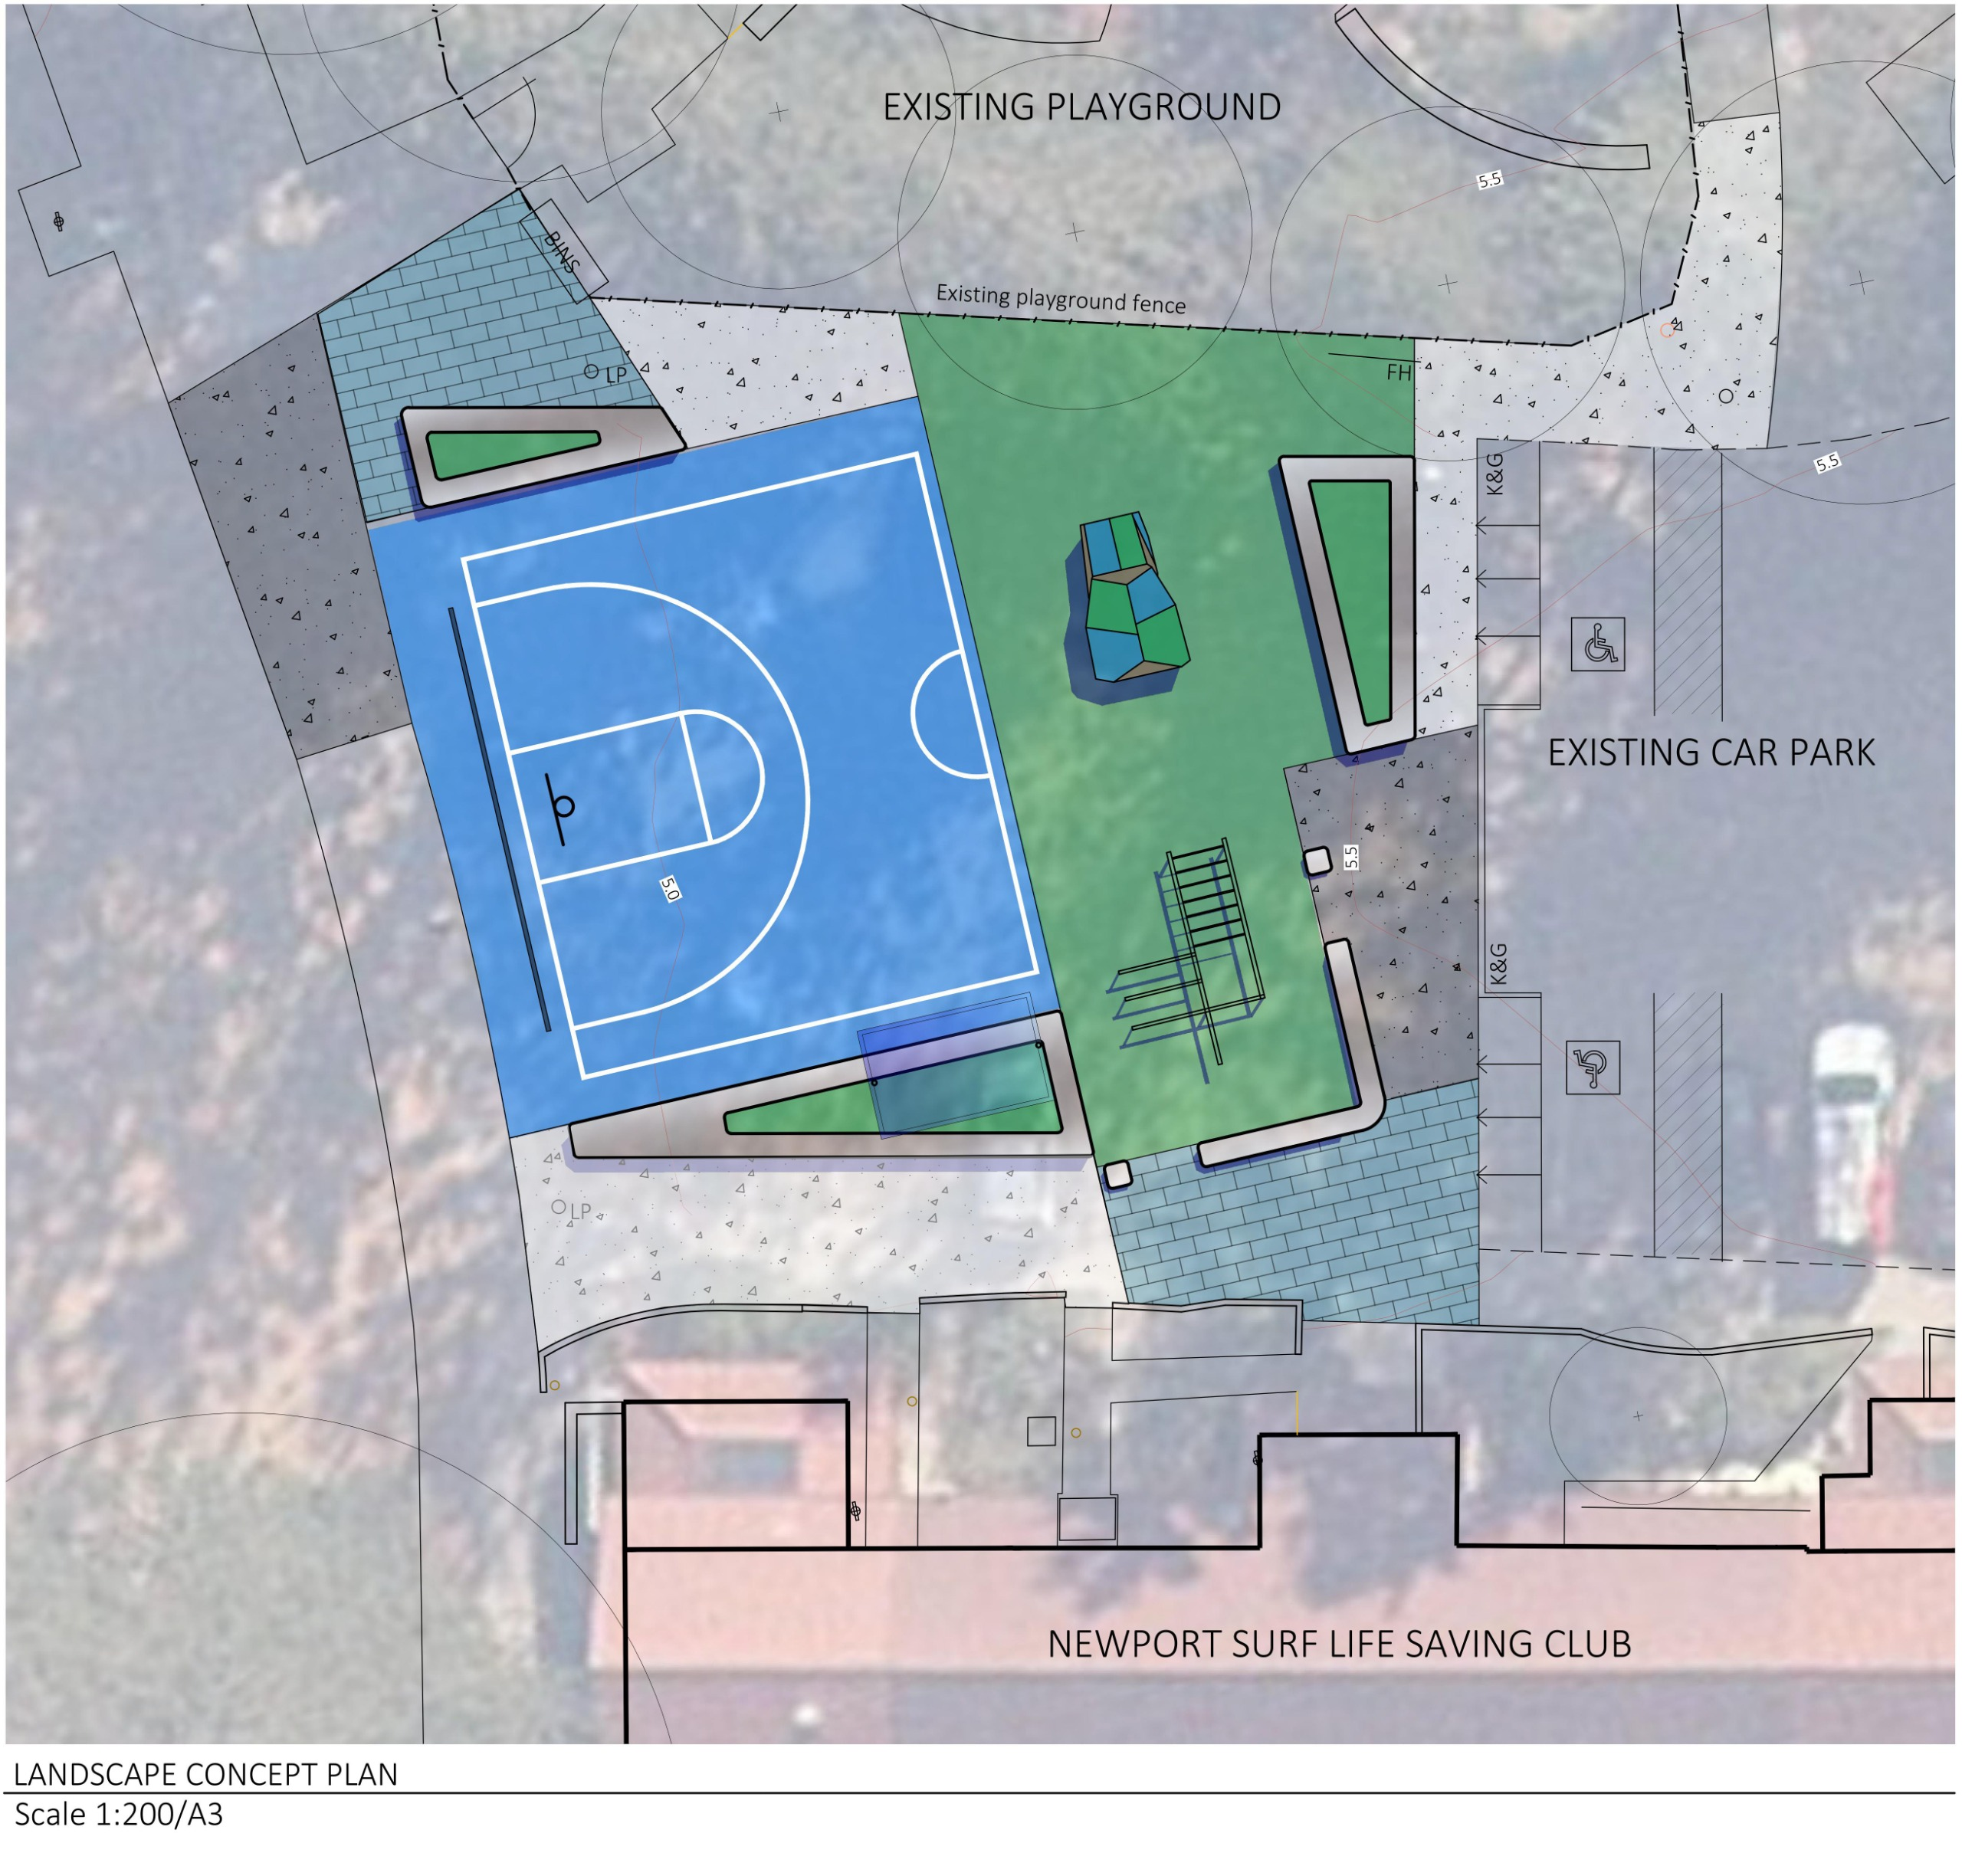 Newport Youth Space Landscape Concept Plan